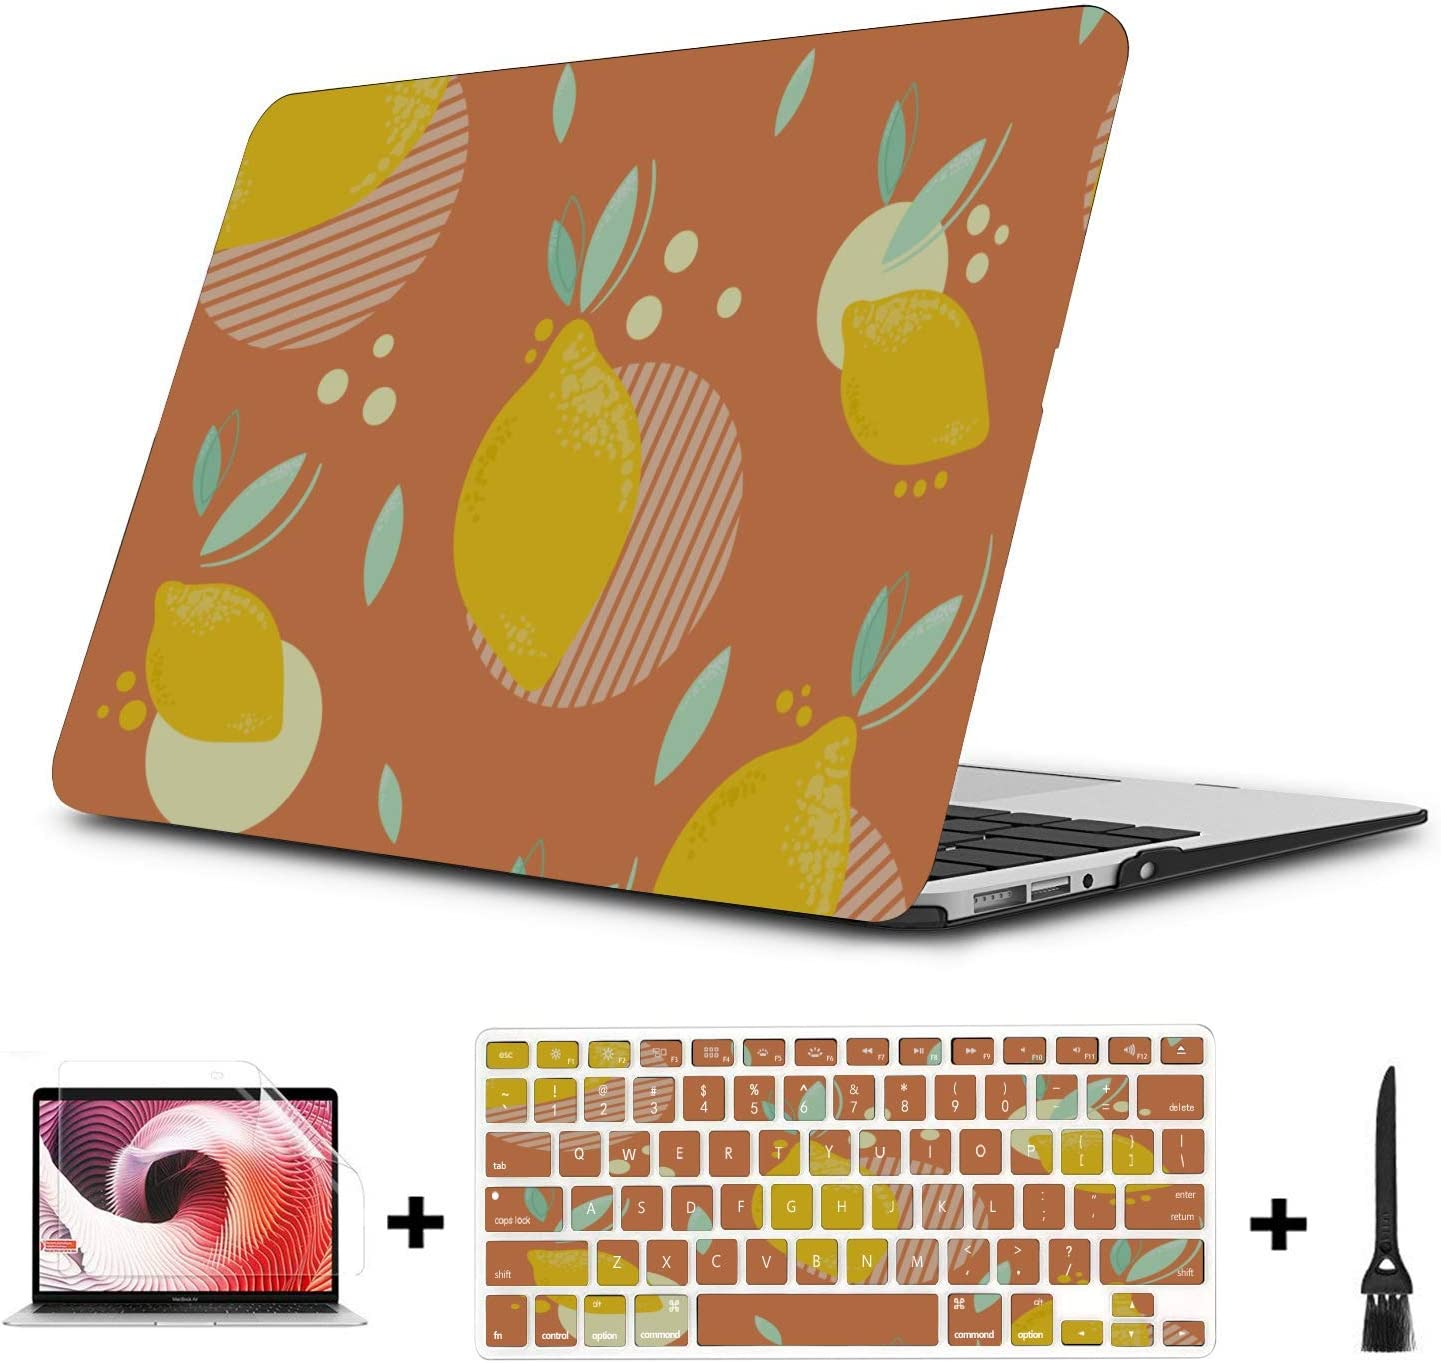 MacBook Pro Covers Summer Sour Retro Cute Fruit Lemon Plastic Hard Shell Compatible Mac Air 11 Pro 13 15 Laptop 13 Inch Case Protection for MacBook 2016-2019 Version